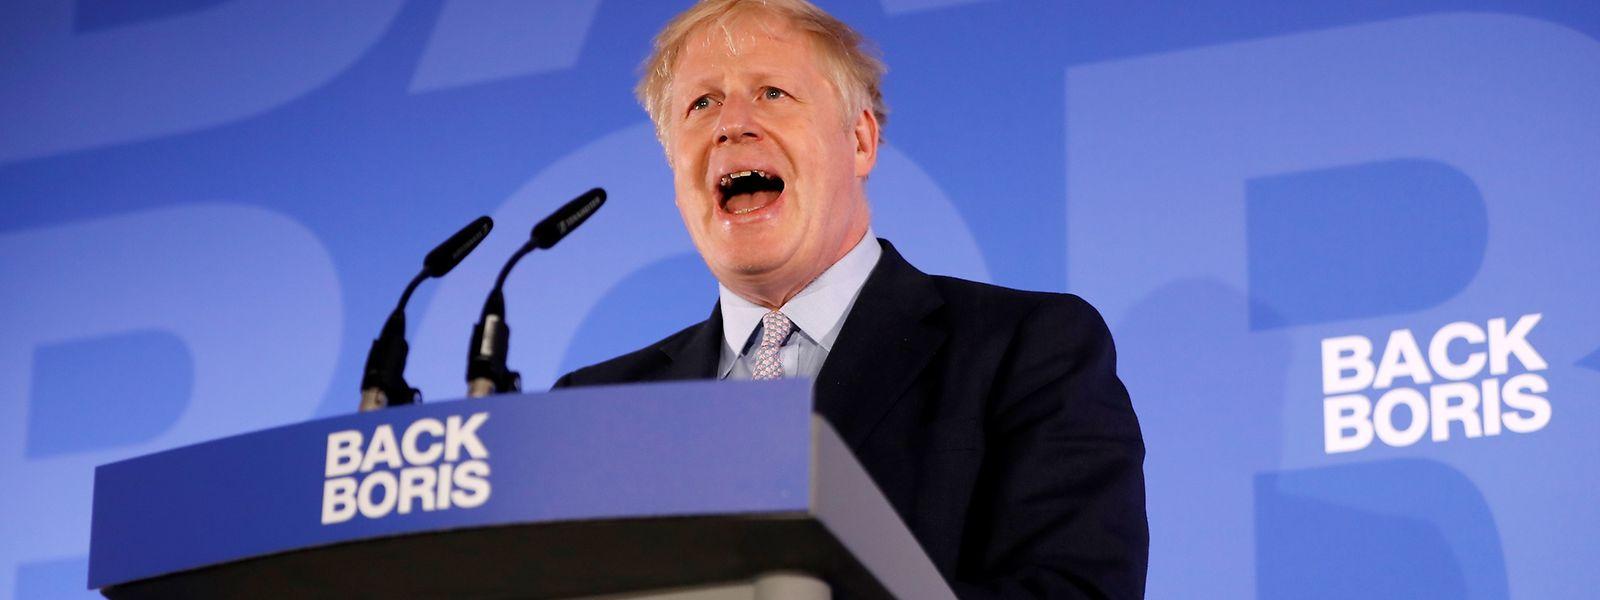 Boris Johnson compte renégocier l'accord de Brexit conclu en novembre entre Bruxelles et Theresa May.